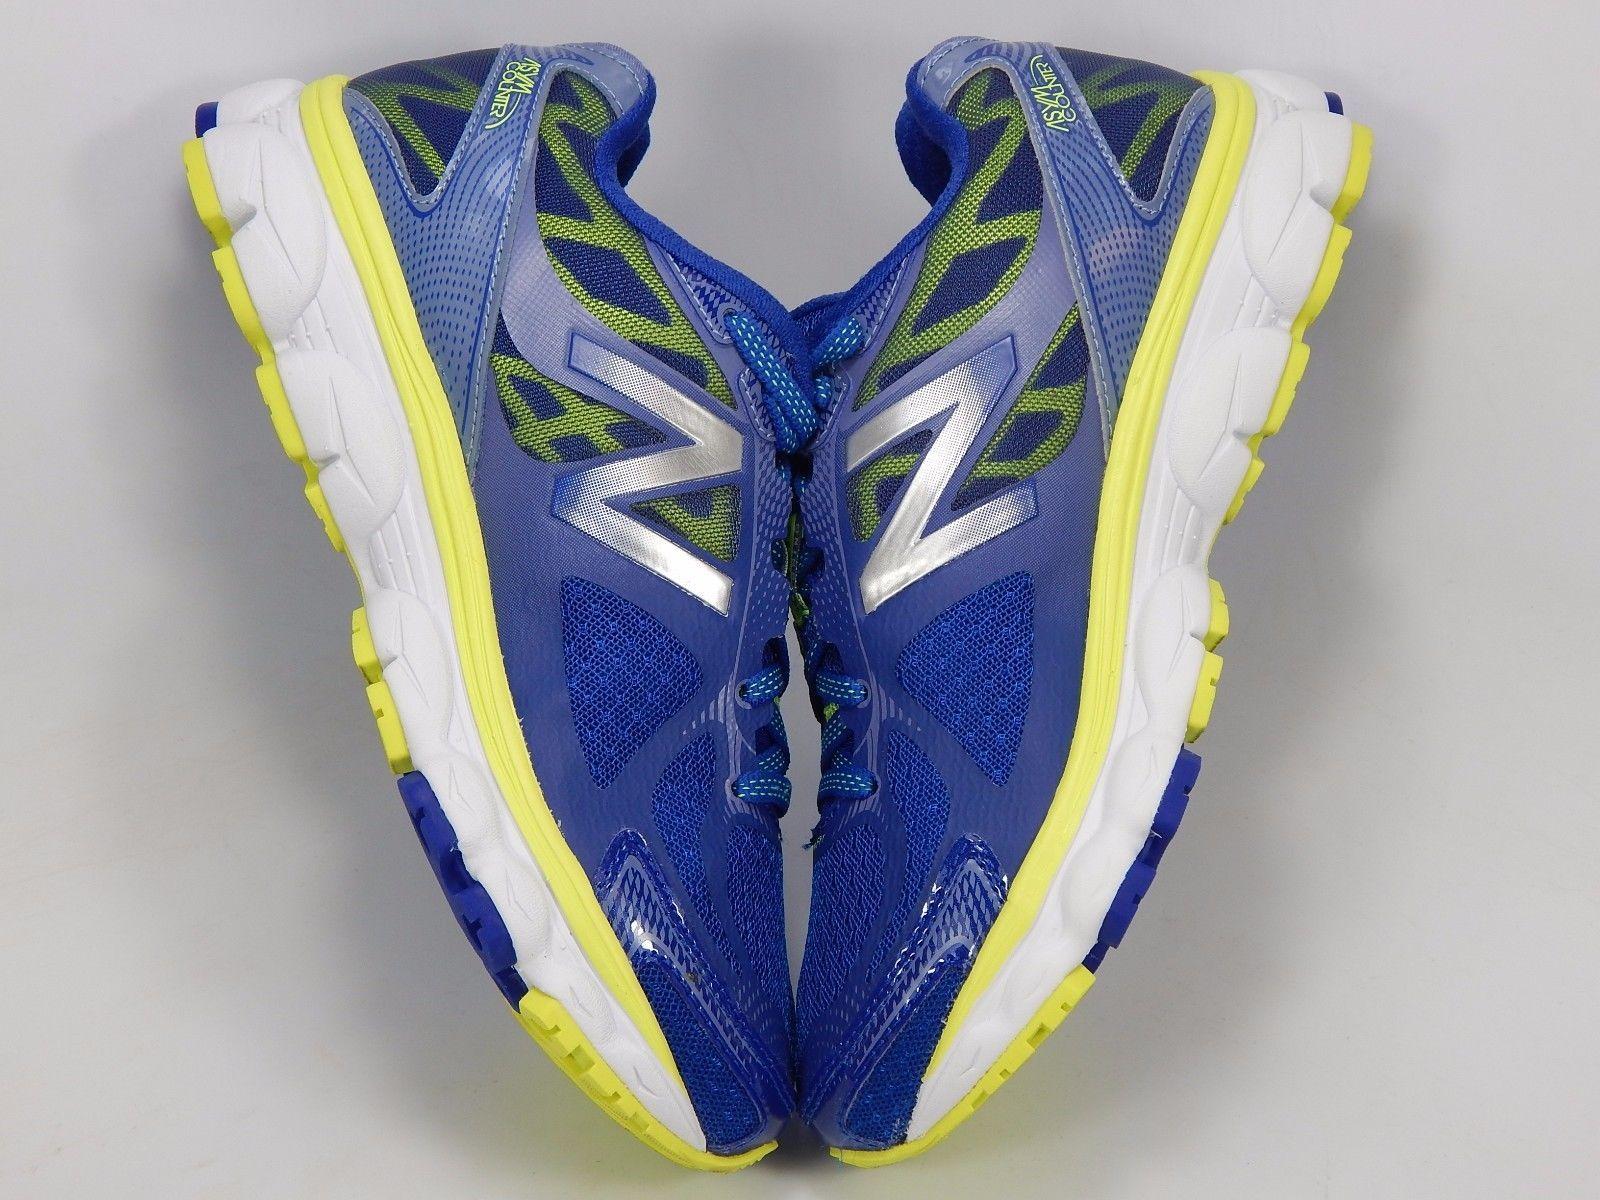 New Balance 1080 v5 Women's Running Shoes Size US 6 M (B) EU 36.5 Blue W1080BY5